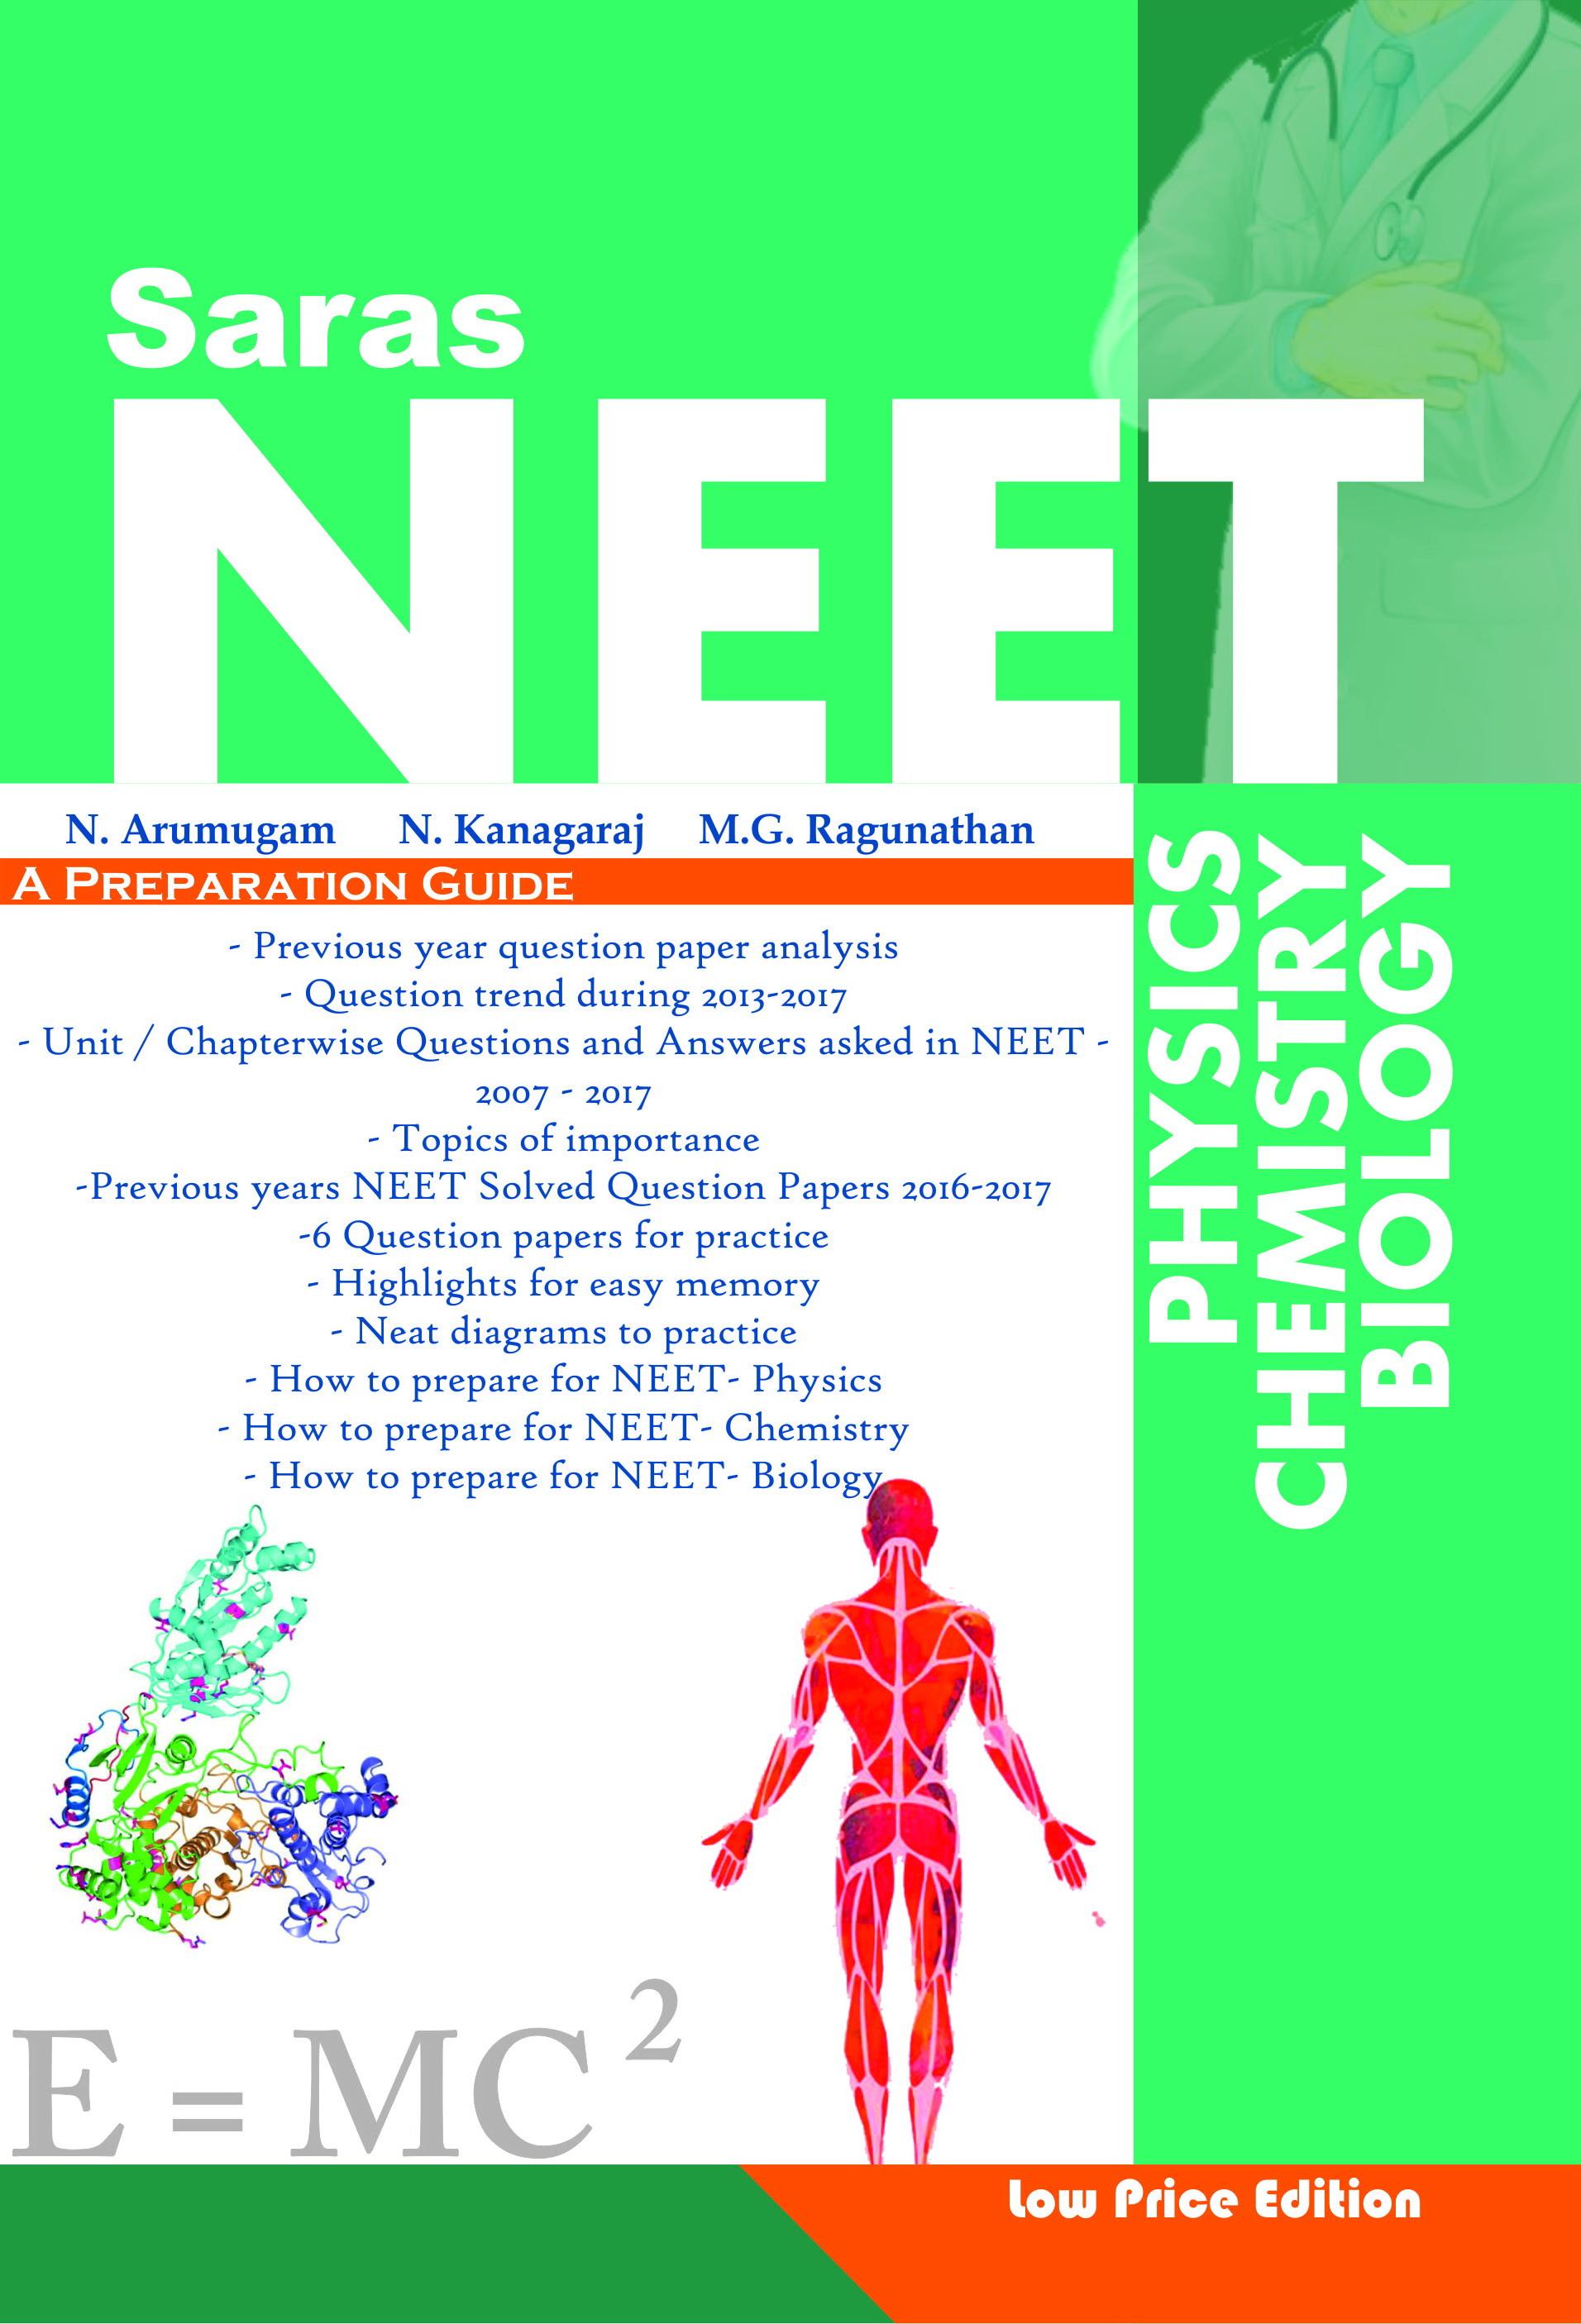 neet physics chemistry biology a preparation guide school books rh saraspublication com Physics Density Practicals Physics Practicals Cool Images